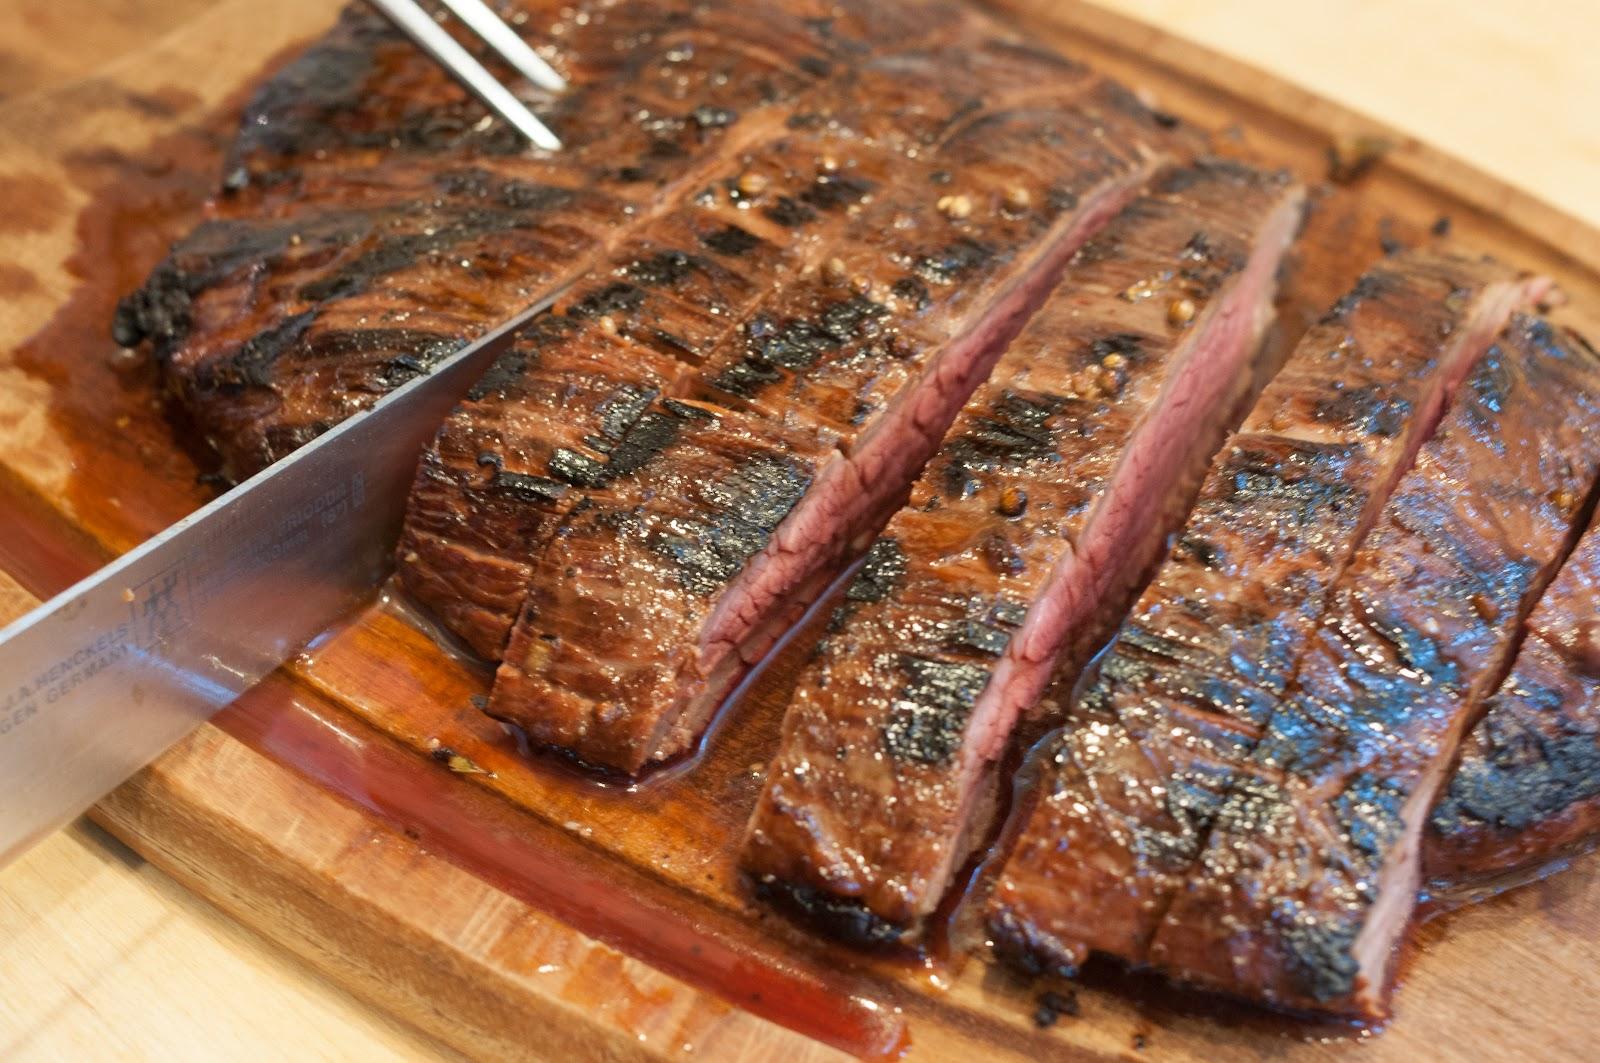 FEAST EVERYDAY: Filipino-Style Steak Marinade by Marty E.